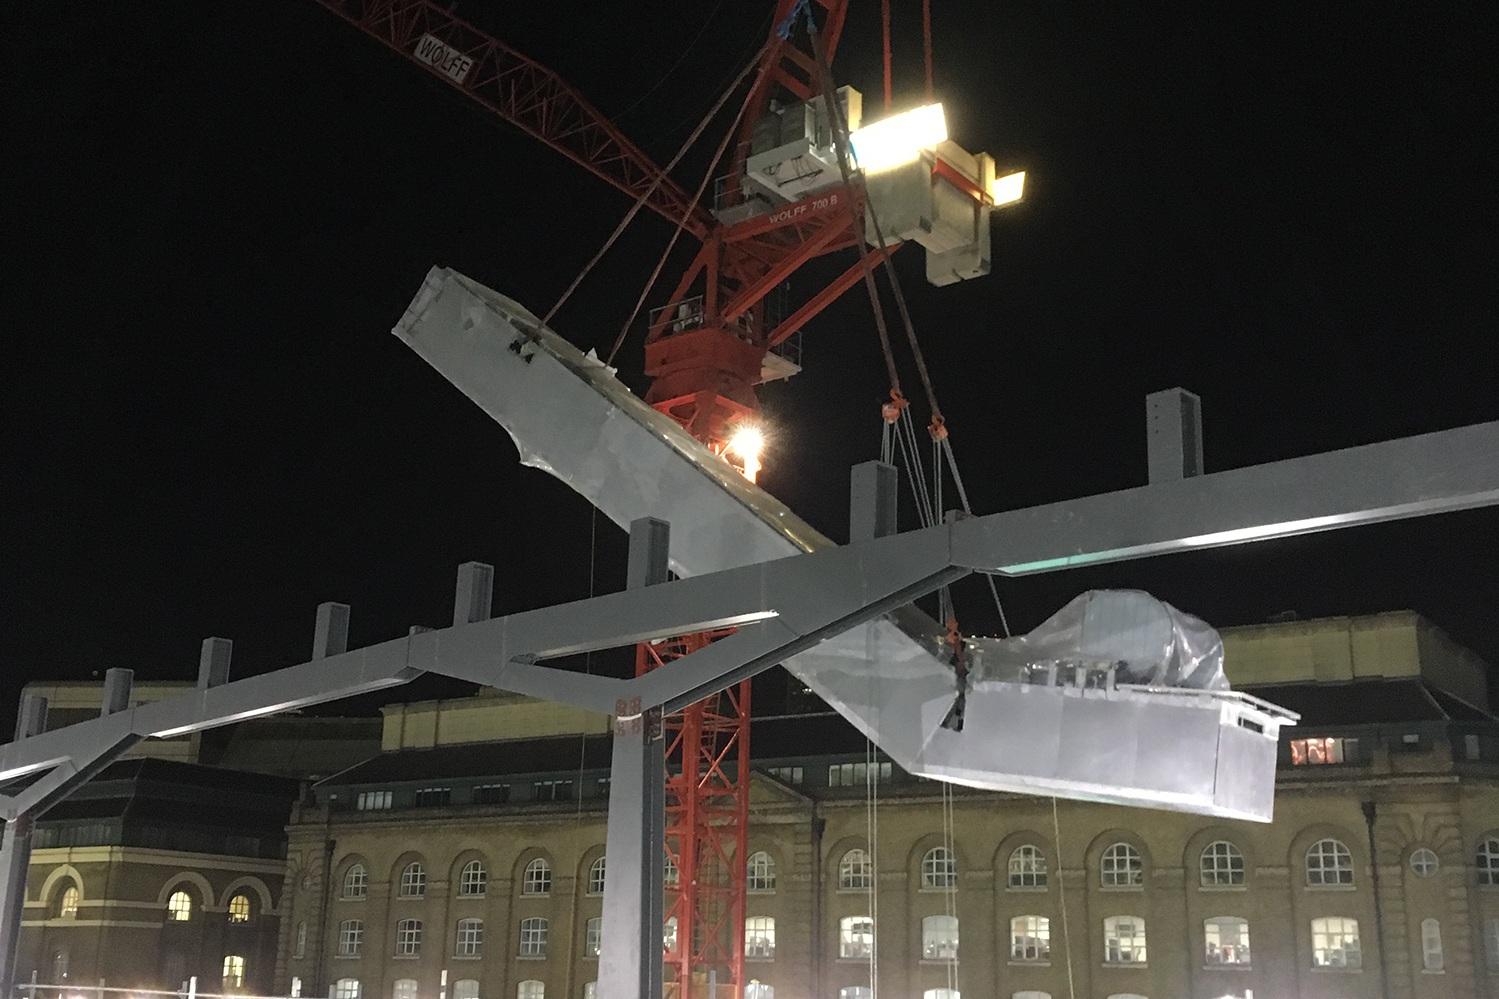 Crane---Site-Tower-Crane---IMG_0164.jpg